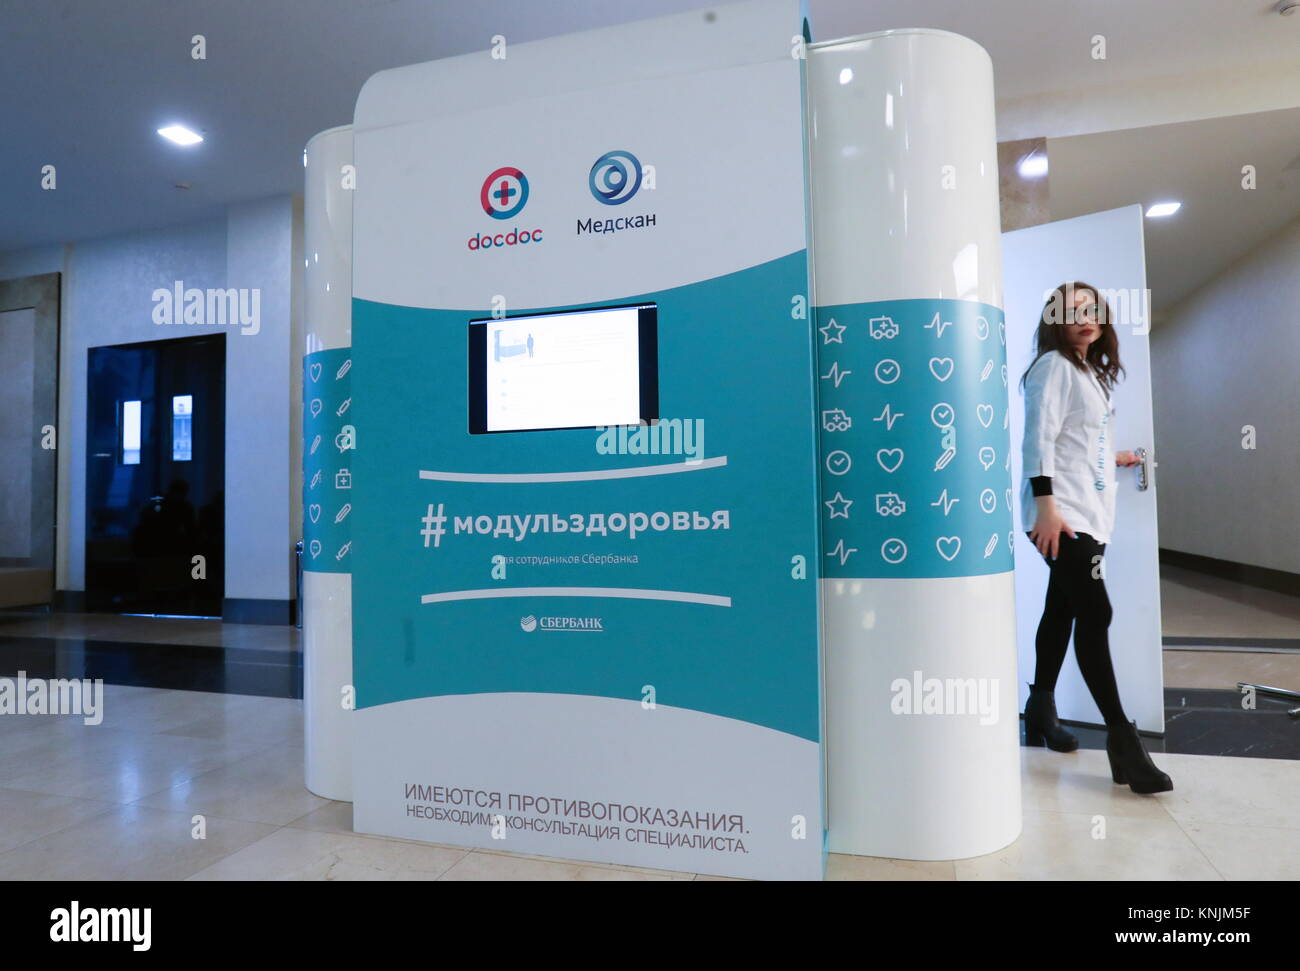 Tele Health Stock Photos & Tele Health Stock Images - Alamy